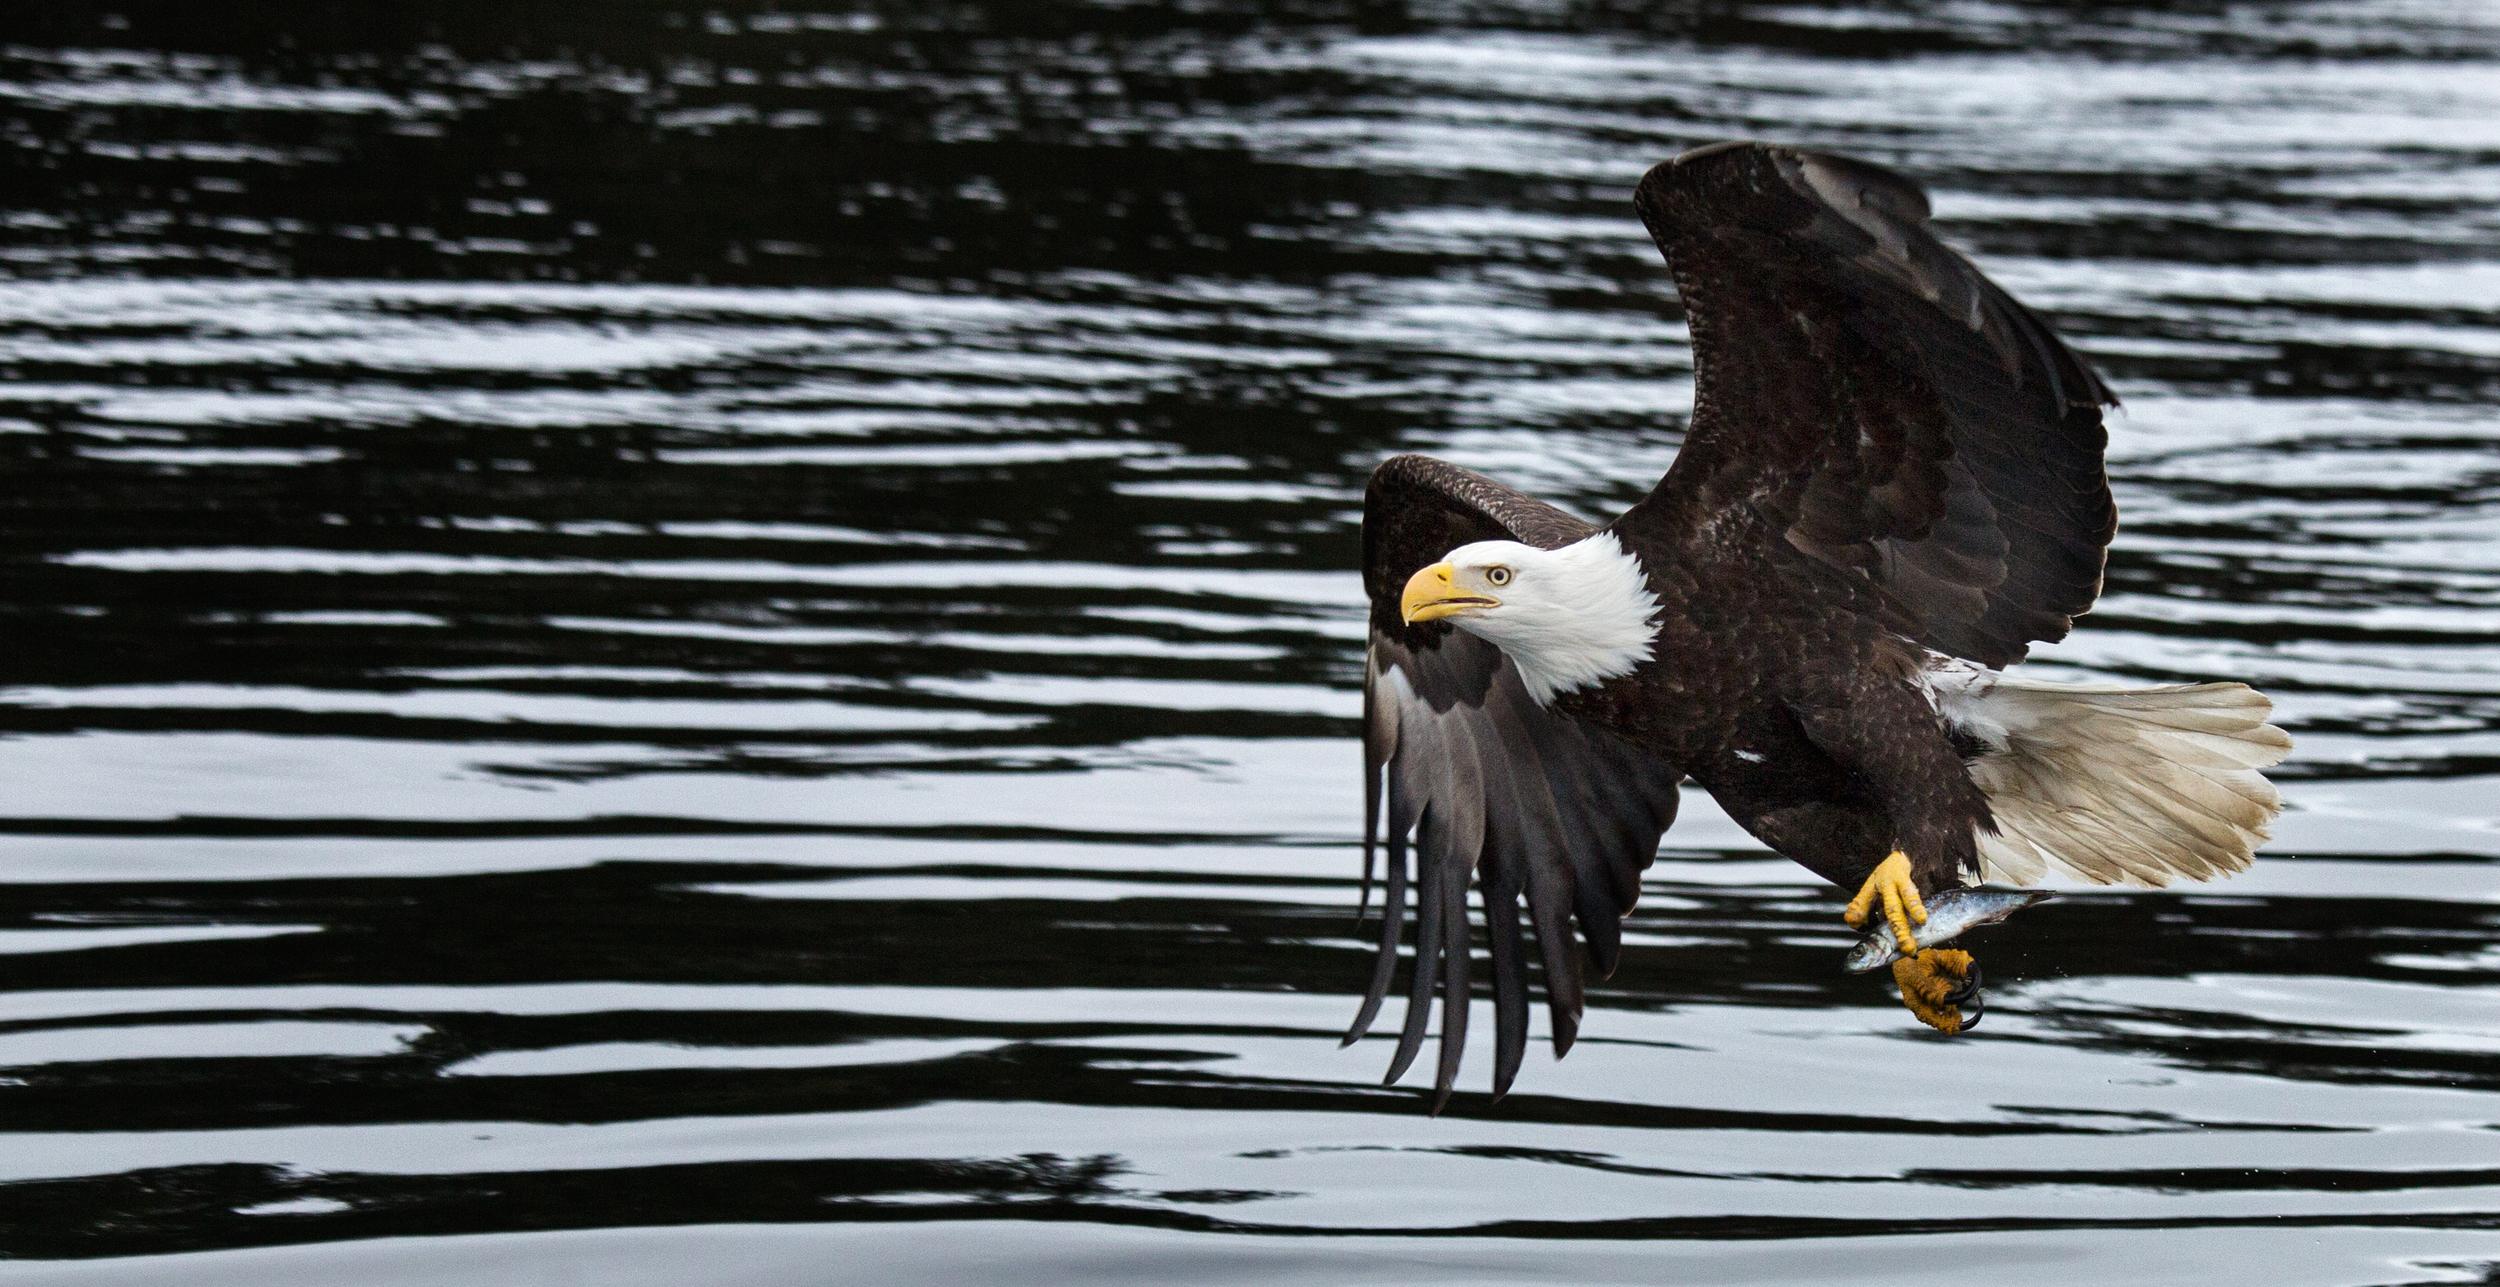 Rick Sammon's Birds009.jpg